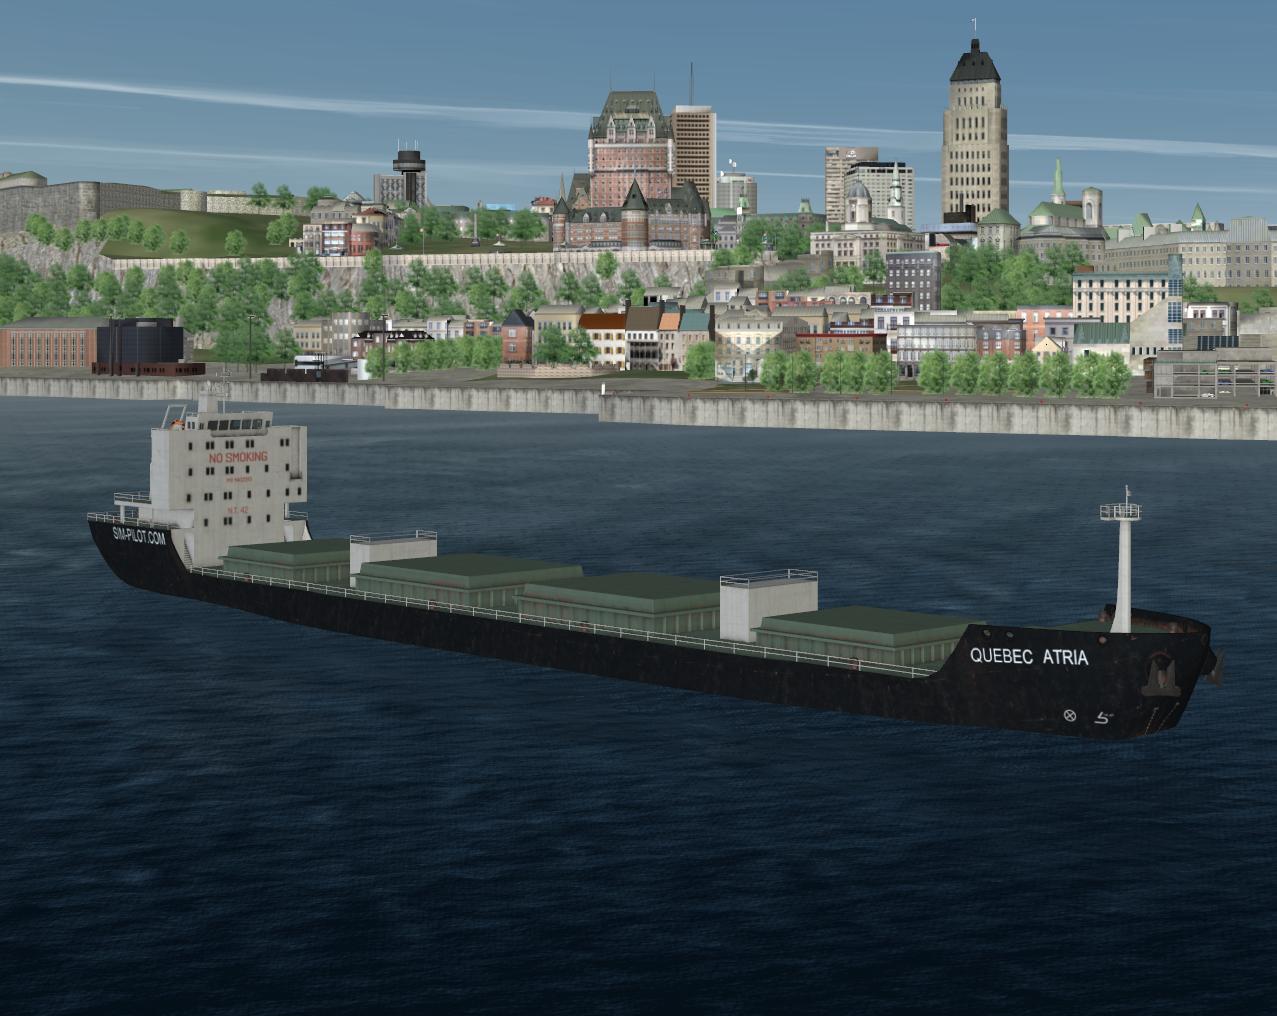 Quebec Atria Image